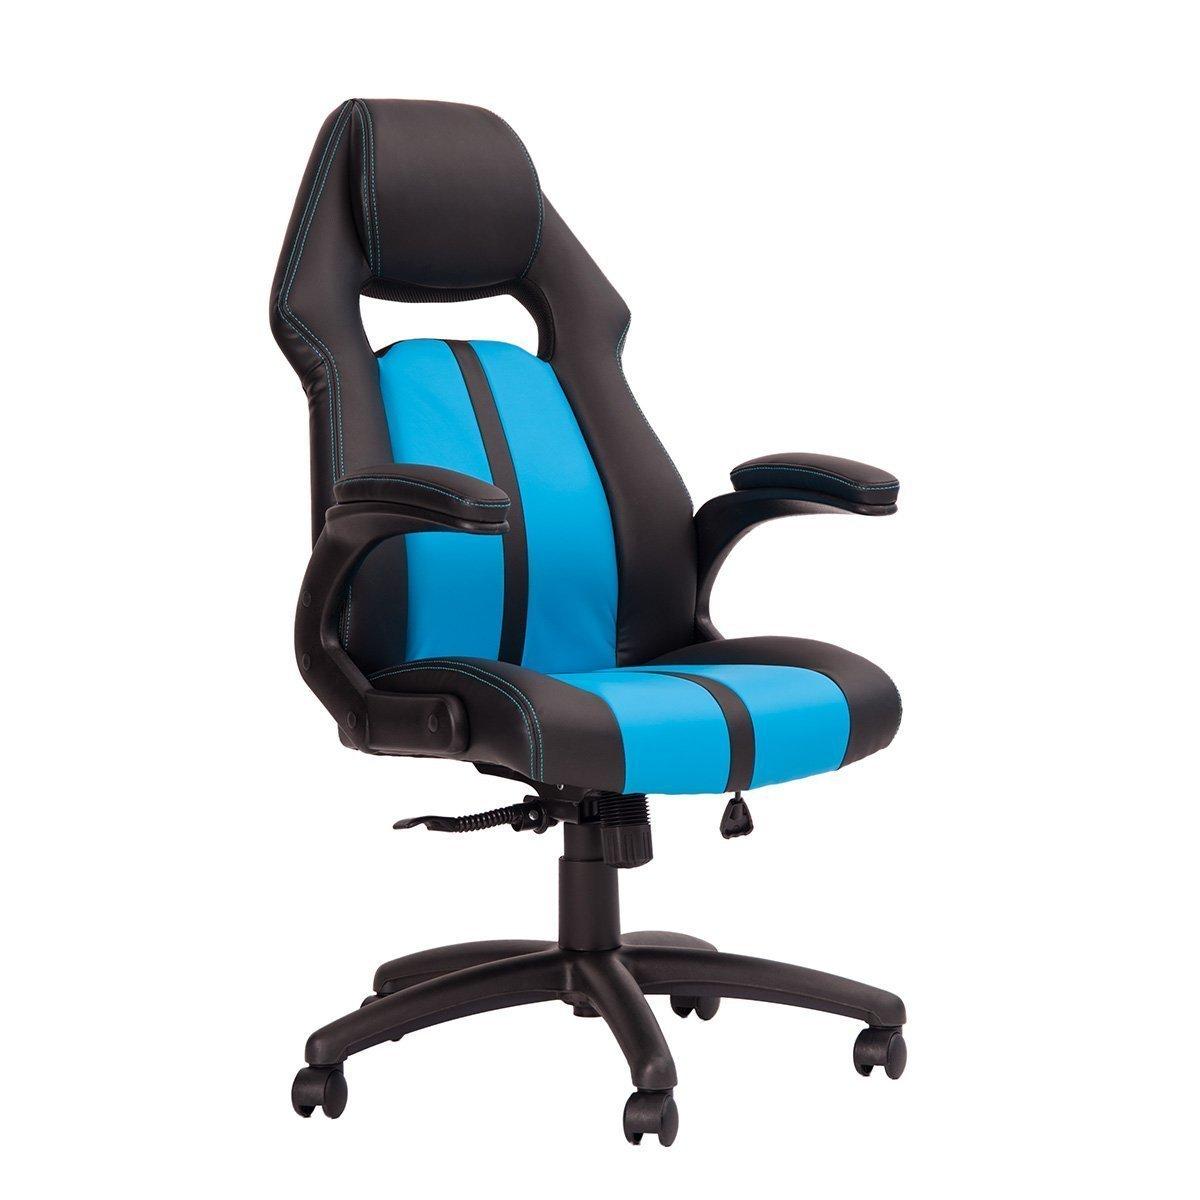 brenton studio task chair outdoor hanging double lounger merax ergonomic racing style pu leather gaming